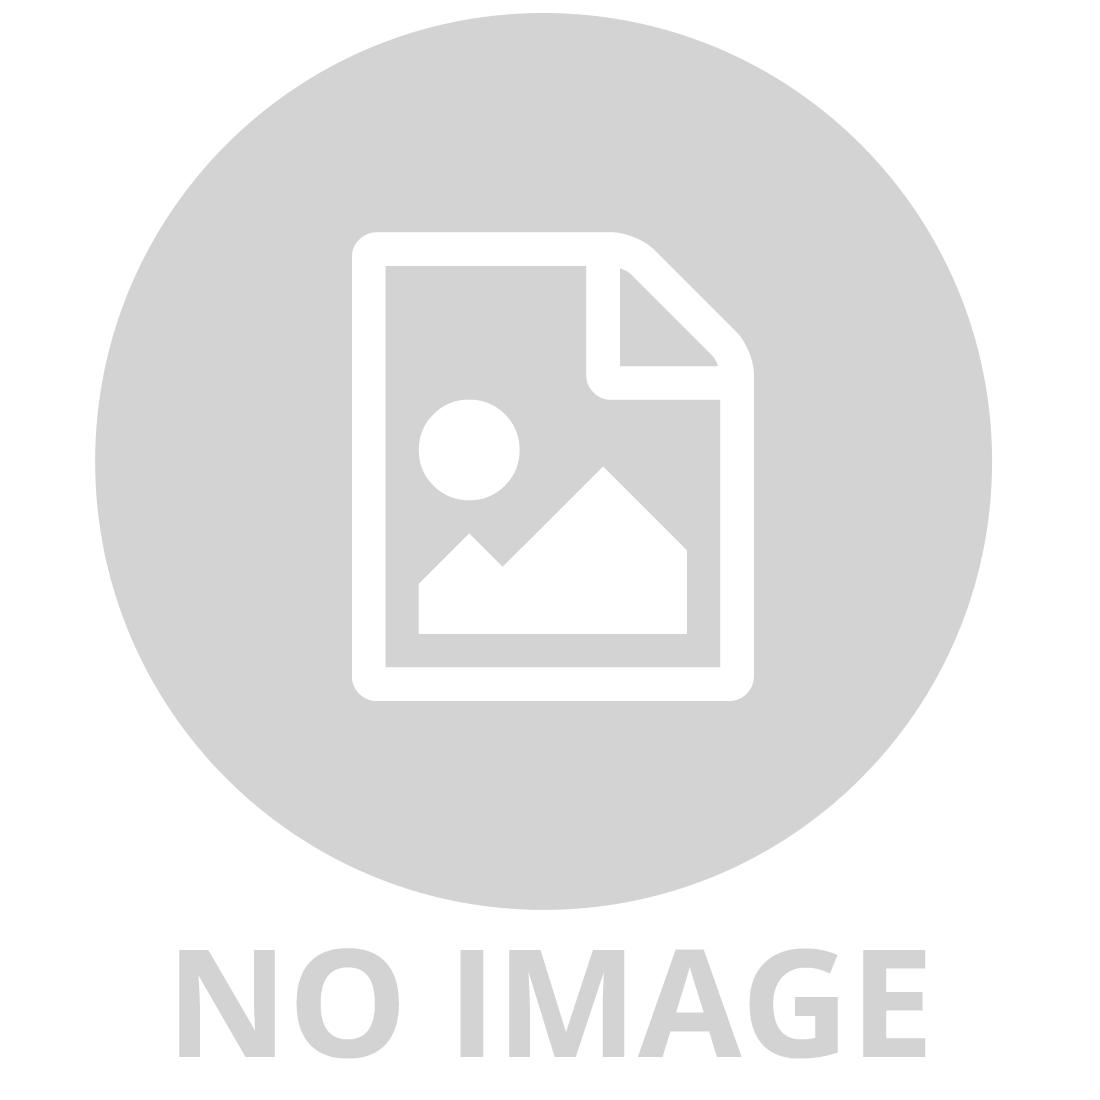 ACADEMY OF MUSIC ELECTRIC KEYBOARD